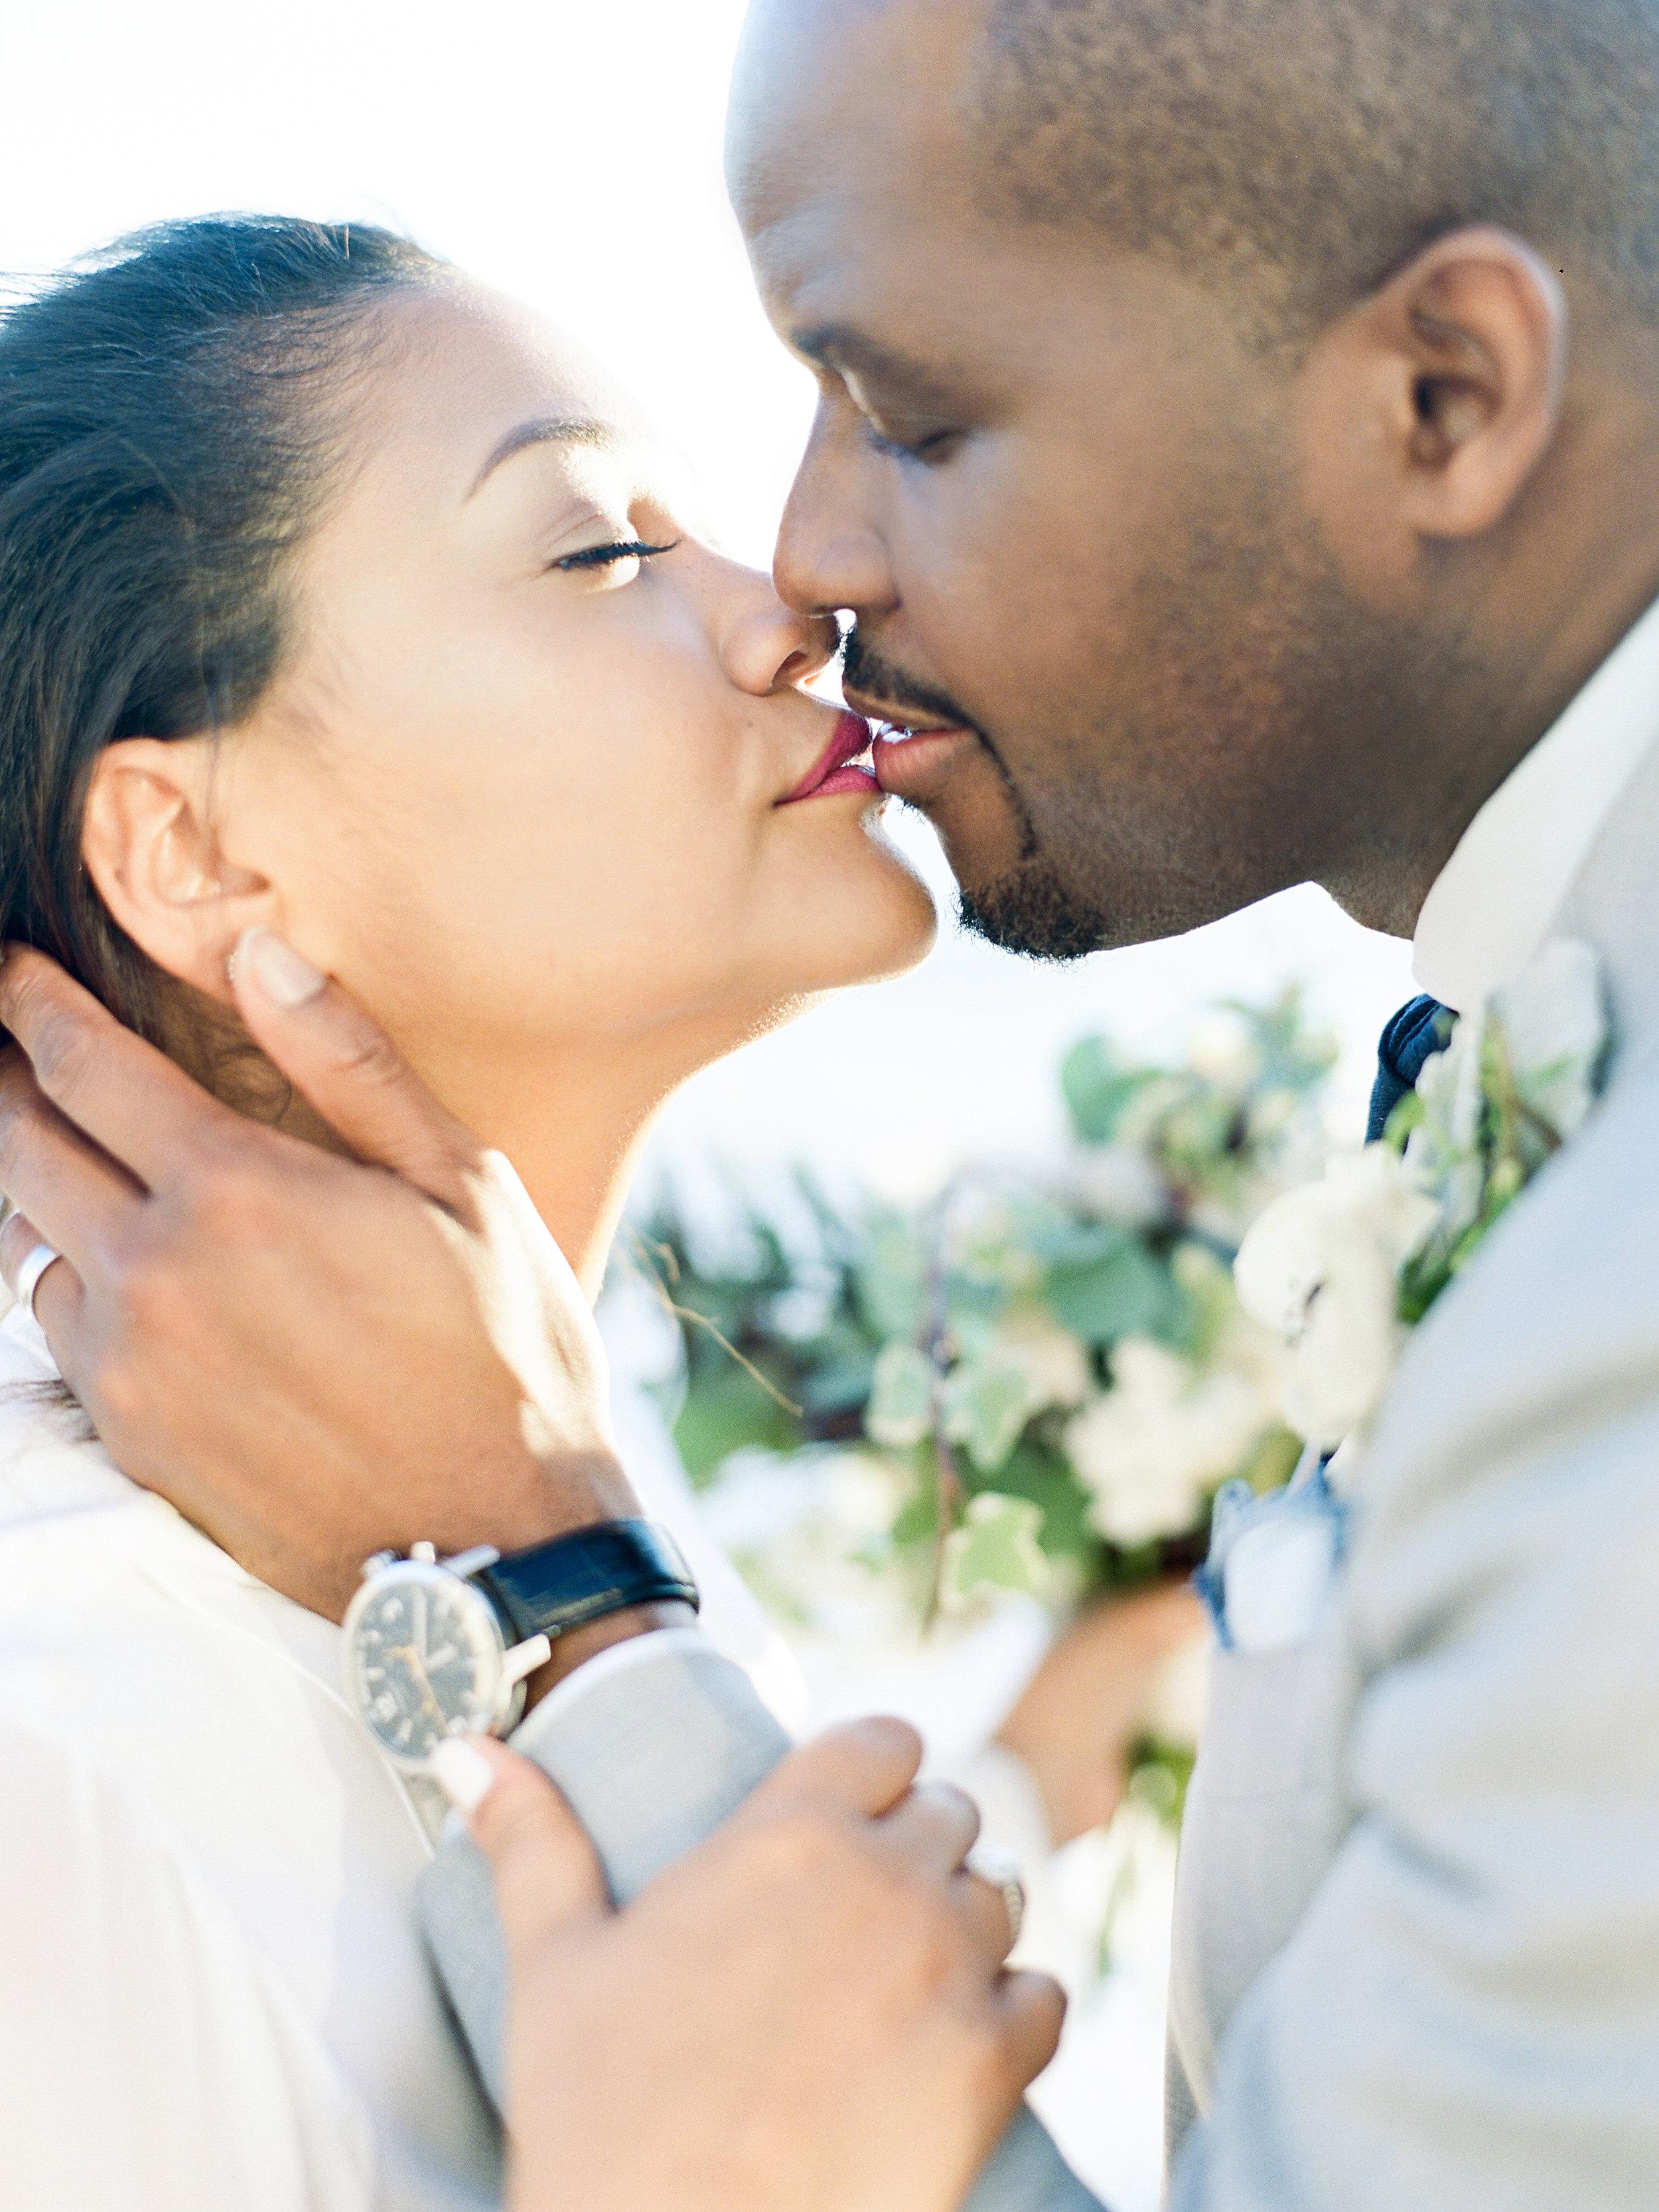 casandra_and_andy_carillon_beach_wedding_photographer_shannon_griffin_bride_and_groom-39.jpg